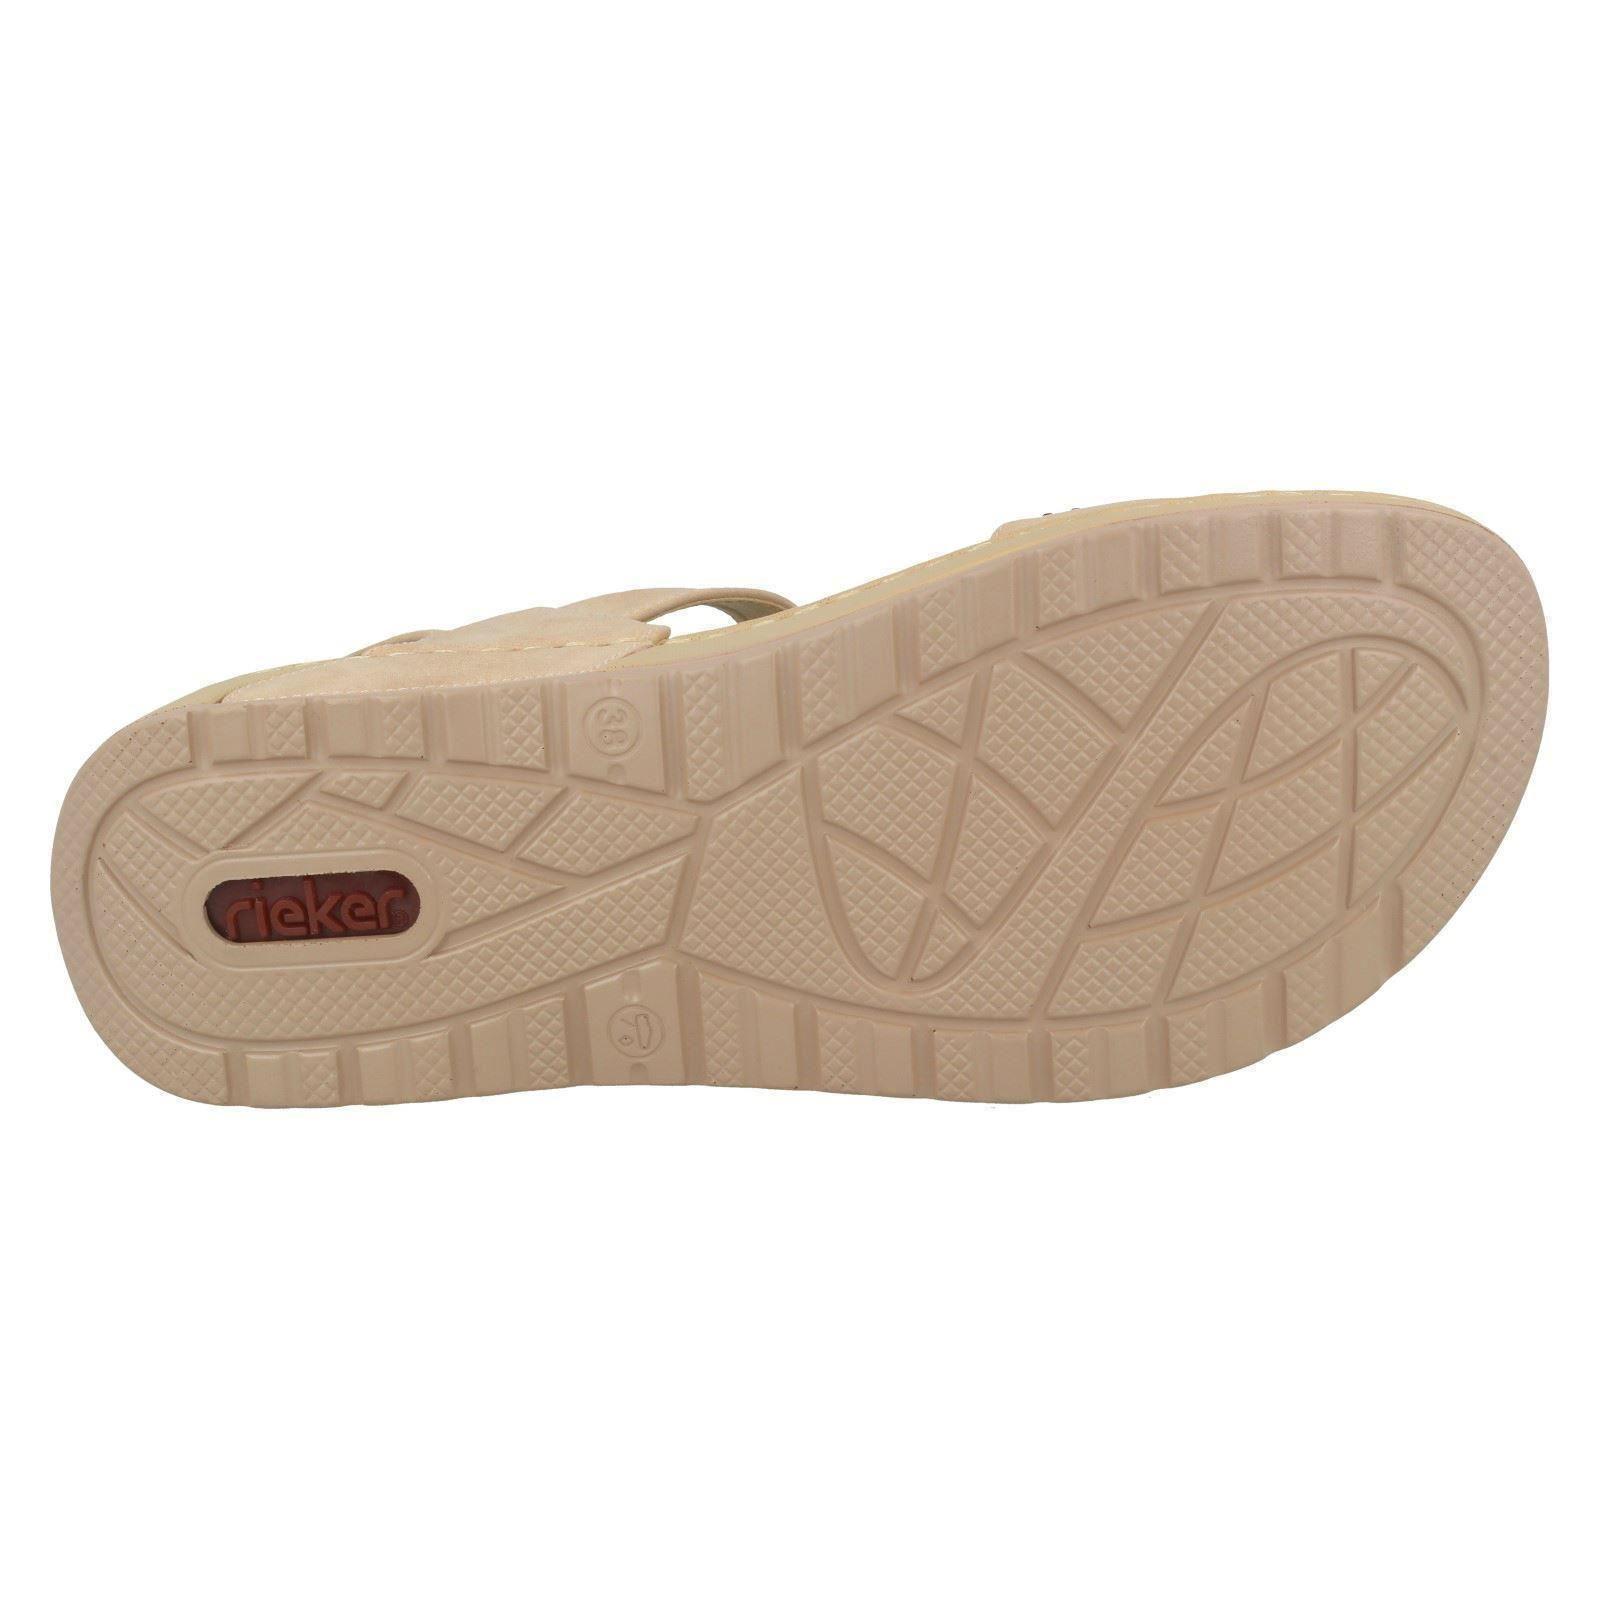 Ladies Rieker Rieker Rieker Sandals The Style - V5772 80acd7